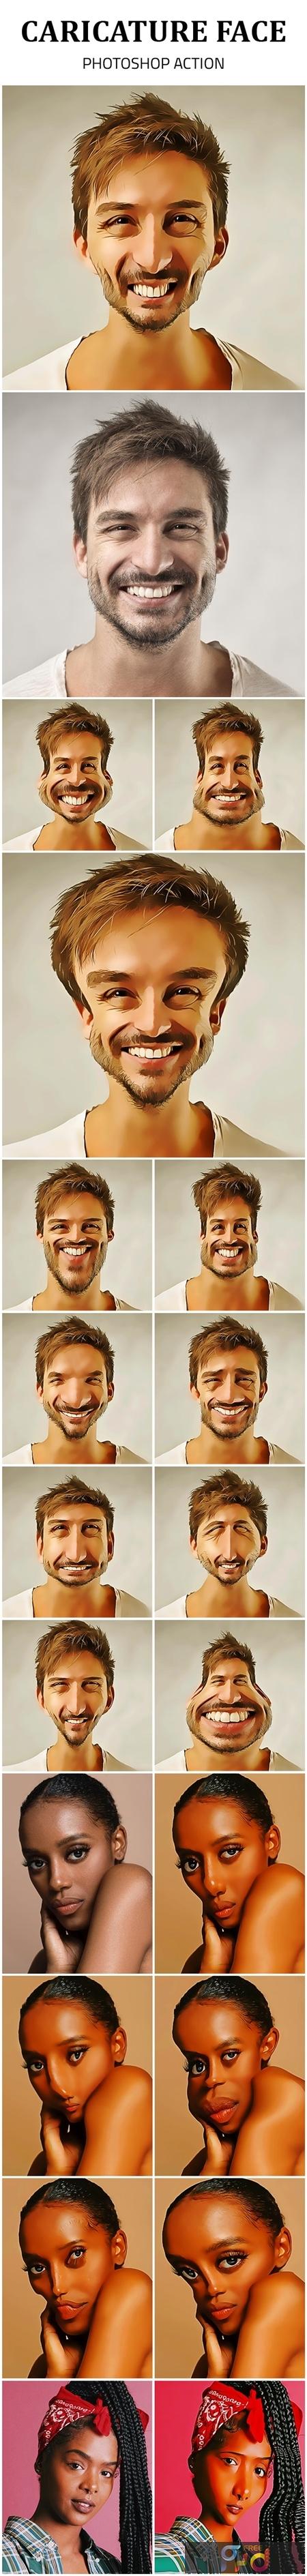 Caricature Face Photoshop Action 25590885 1